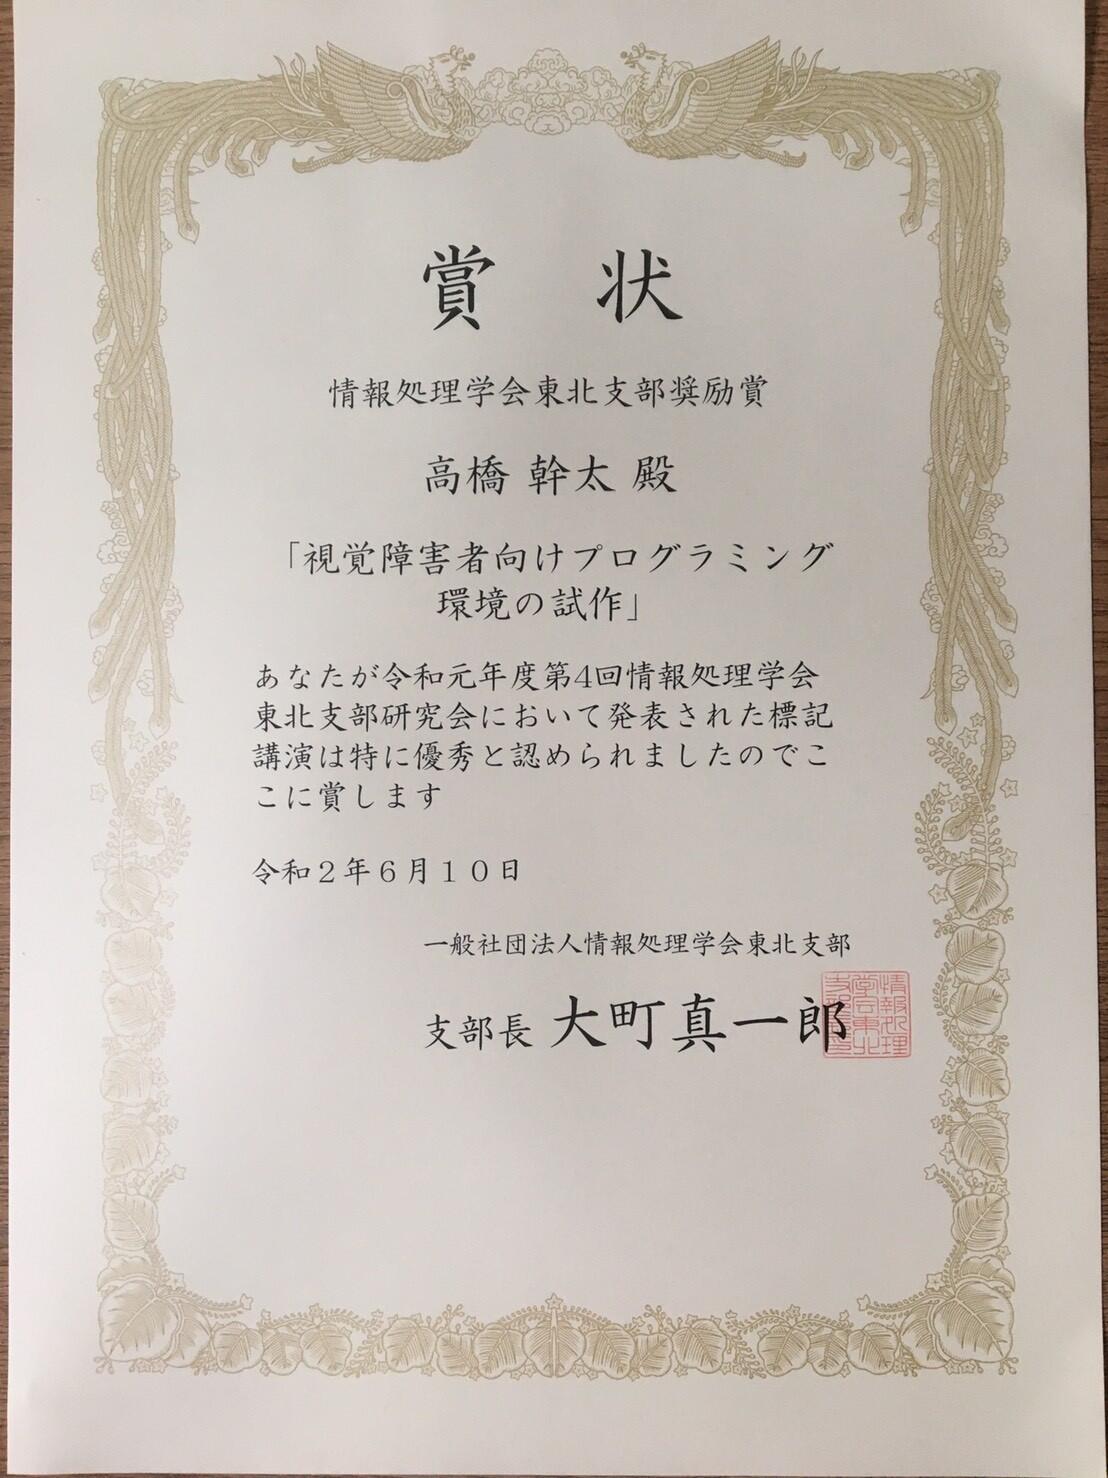 https://www.tohoku-gakuin.ac.jp/info/content/200615-2_1.jpg